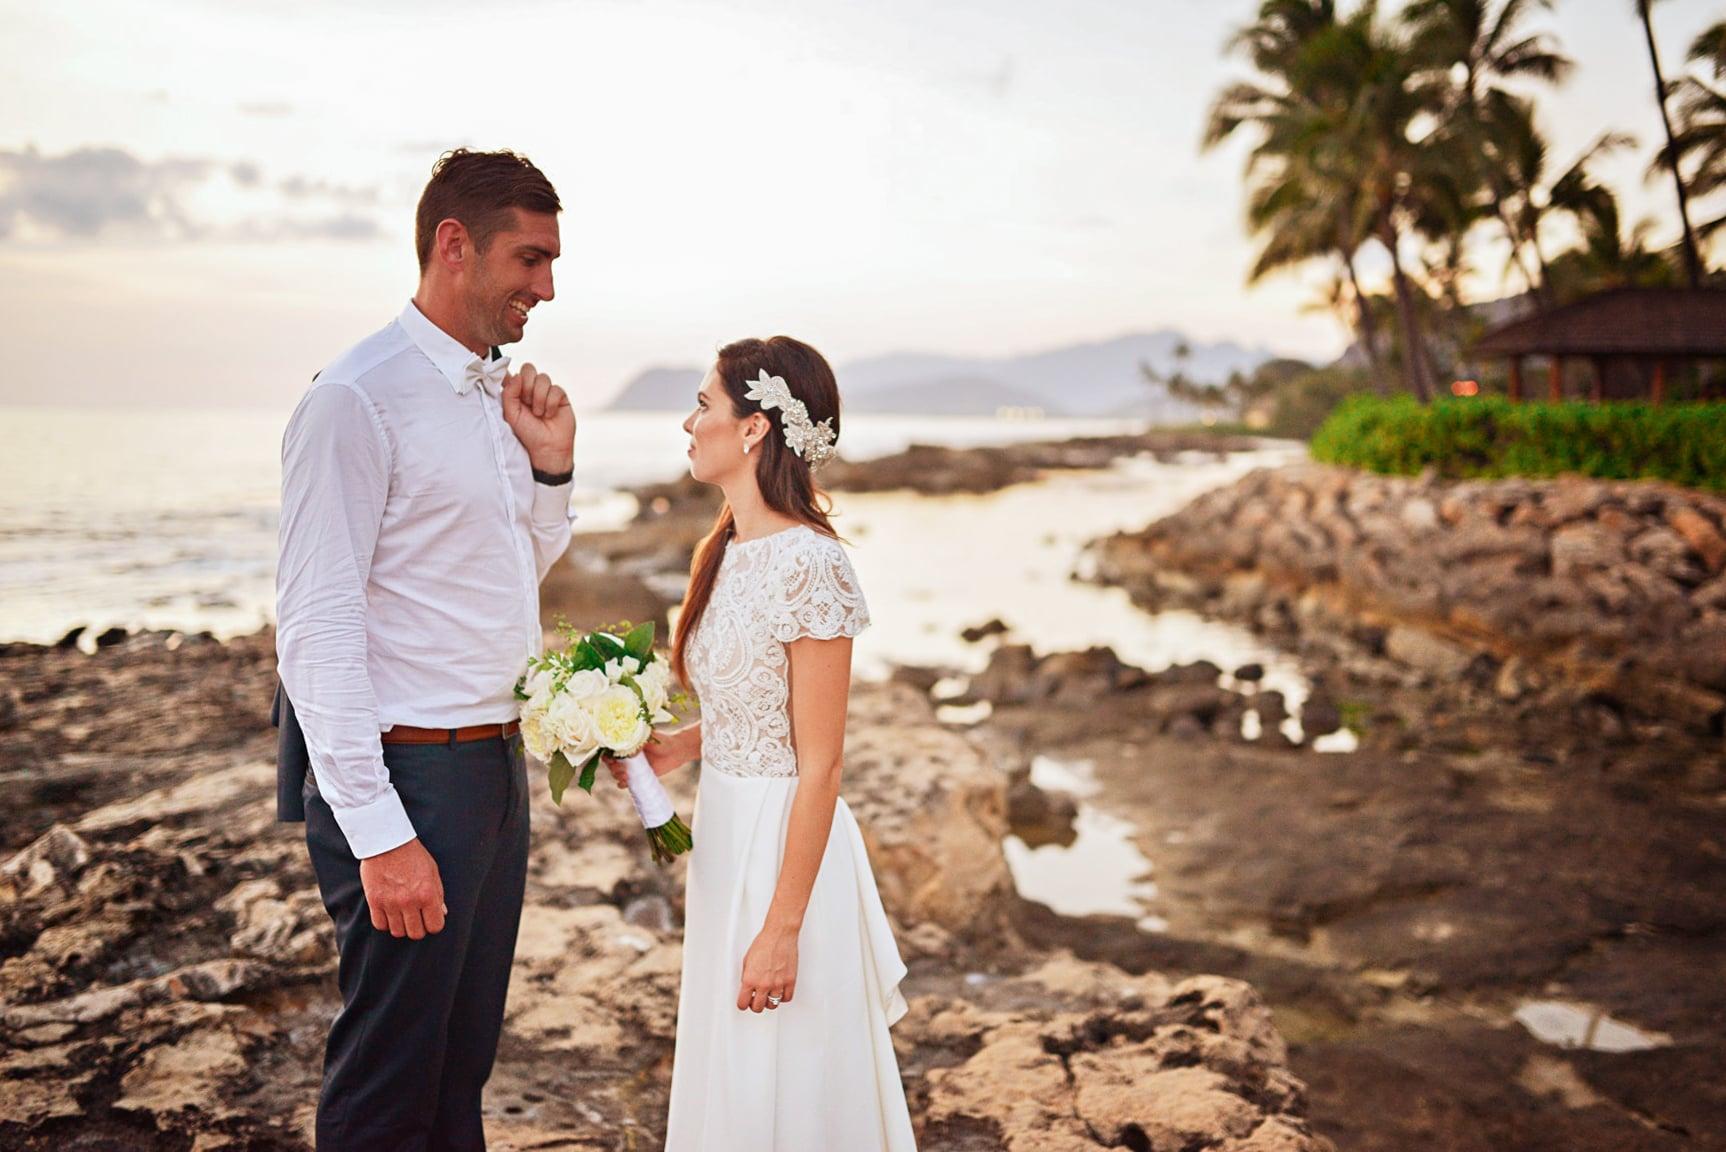 lanikuhonua beach wedding oahu hawaii stephen ludwig020.jpg